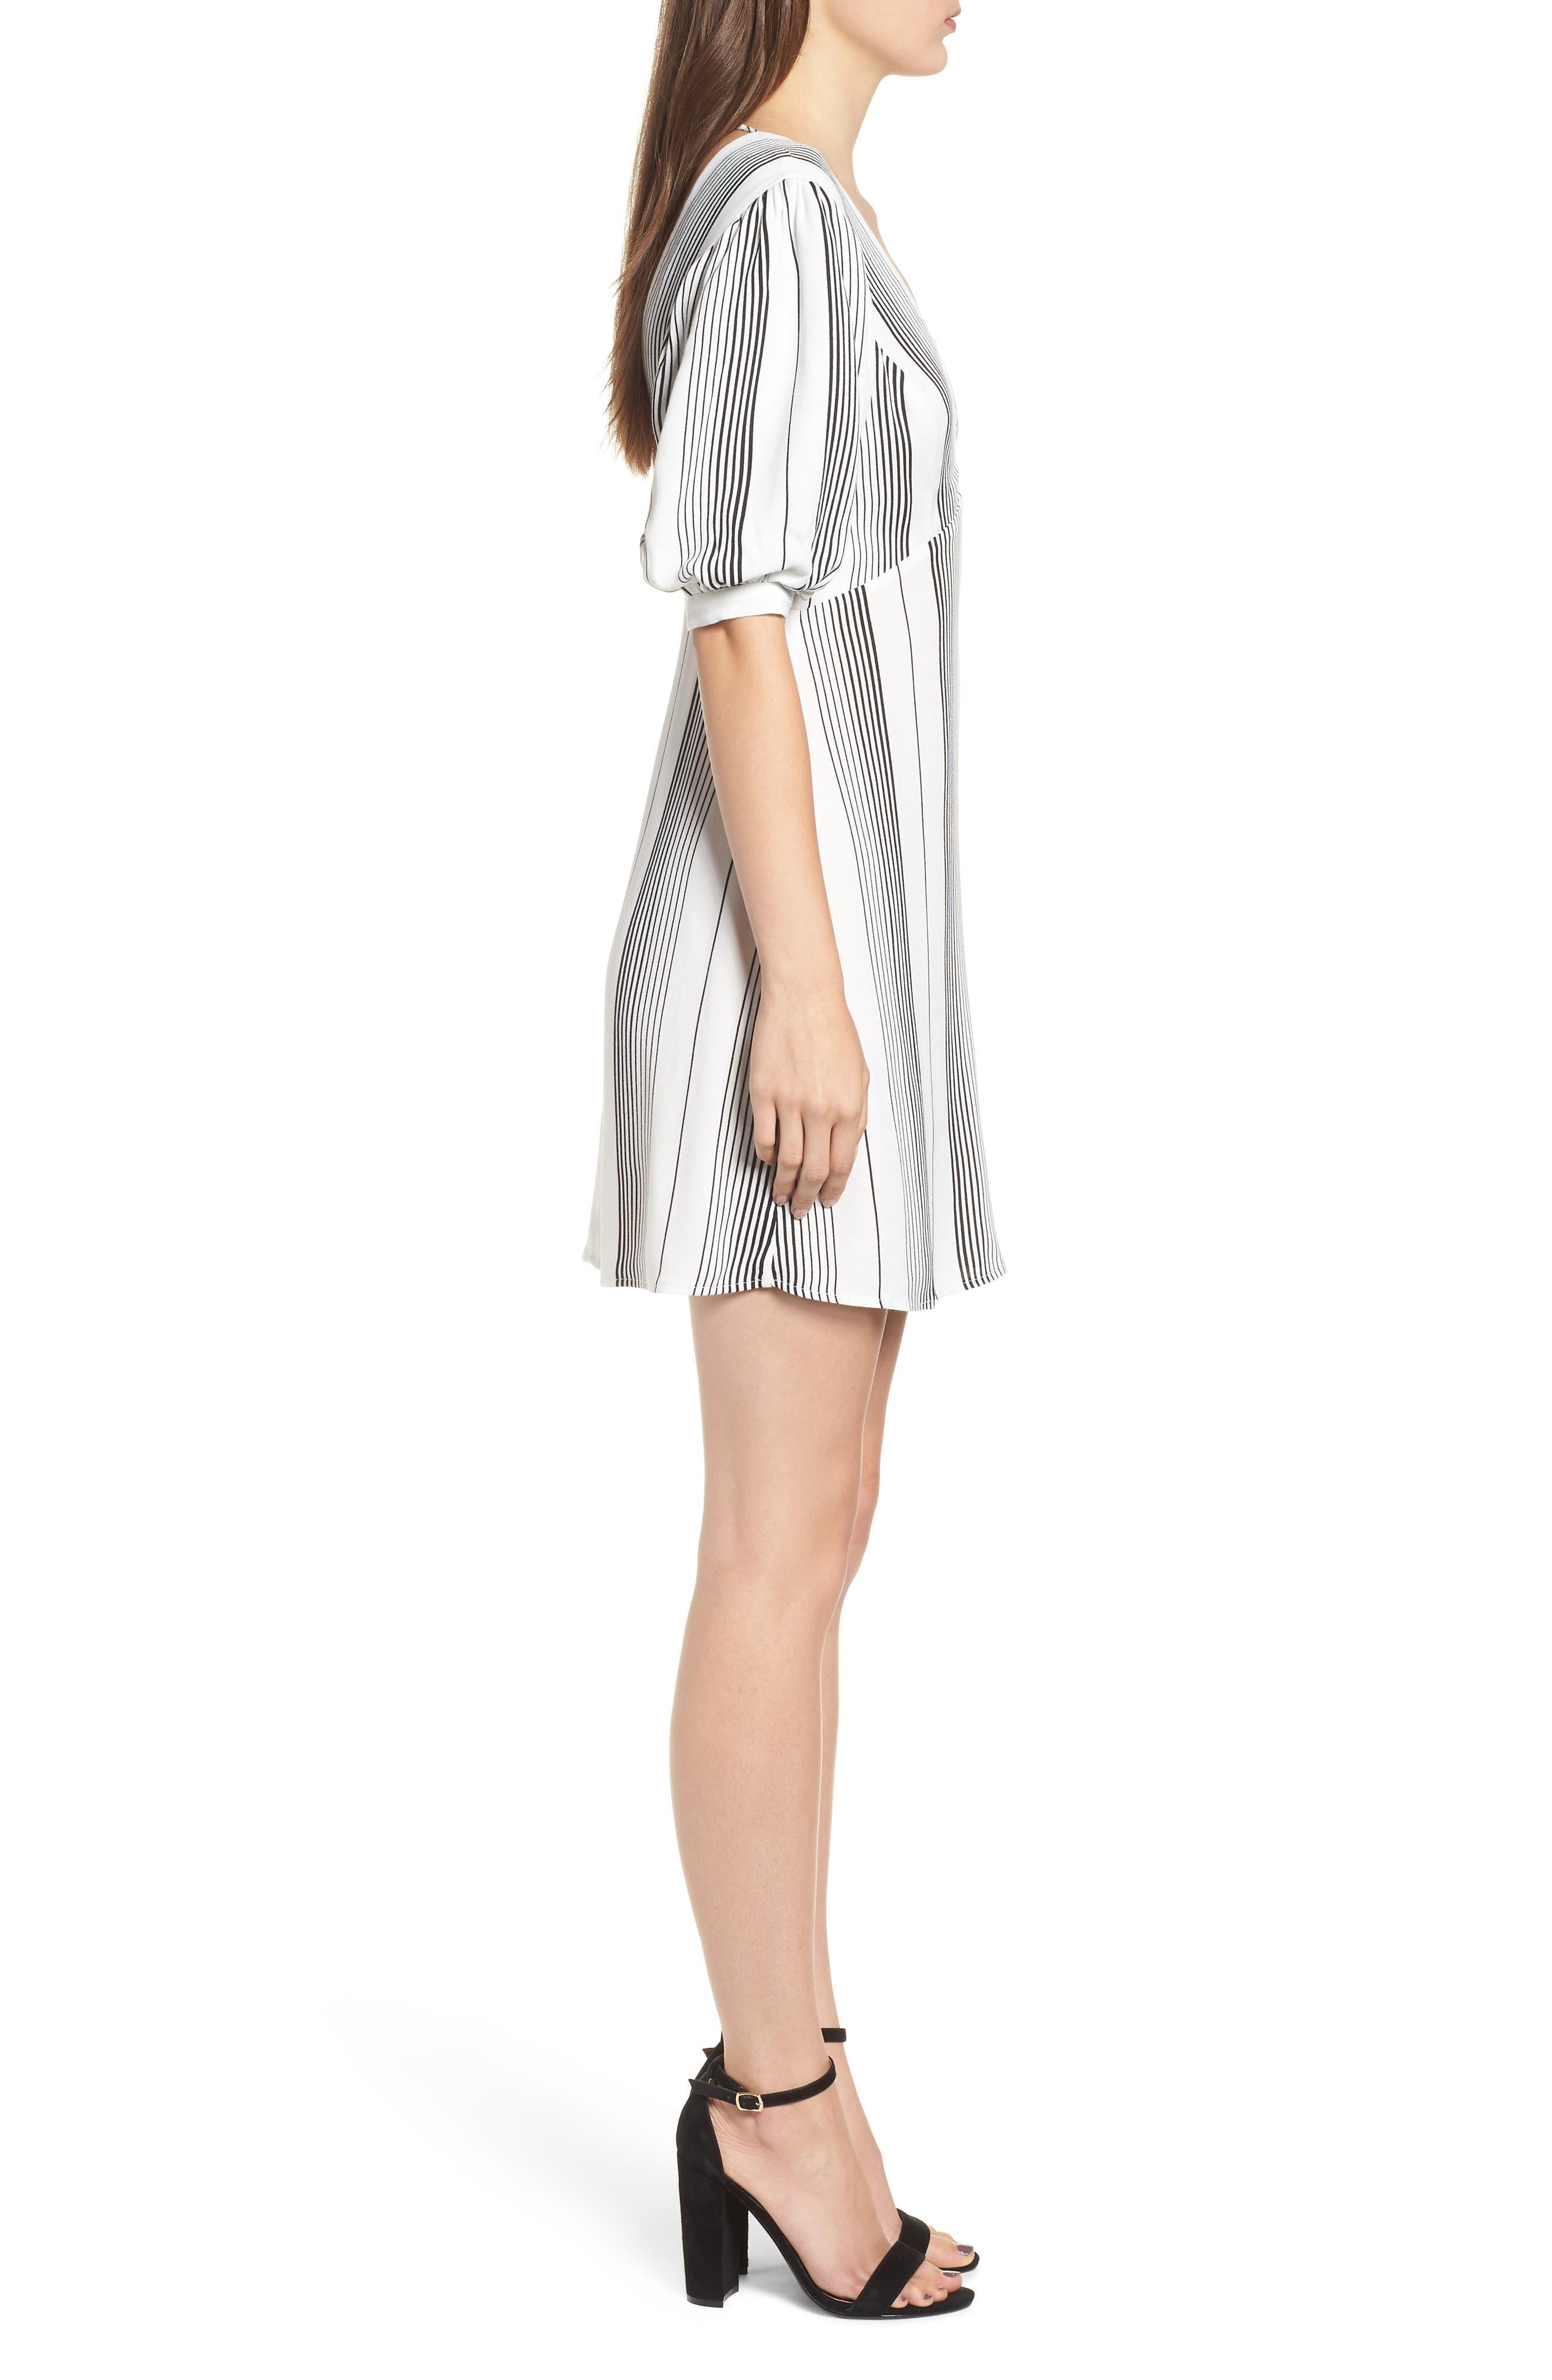 Jolie Minidress,                             Alternate thumbnail 2, color,                             BLANC STRIPE